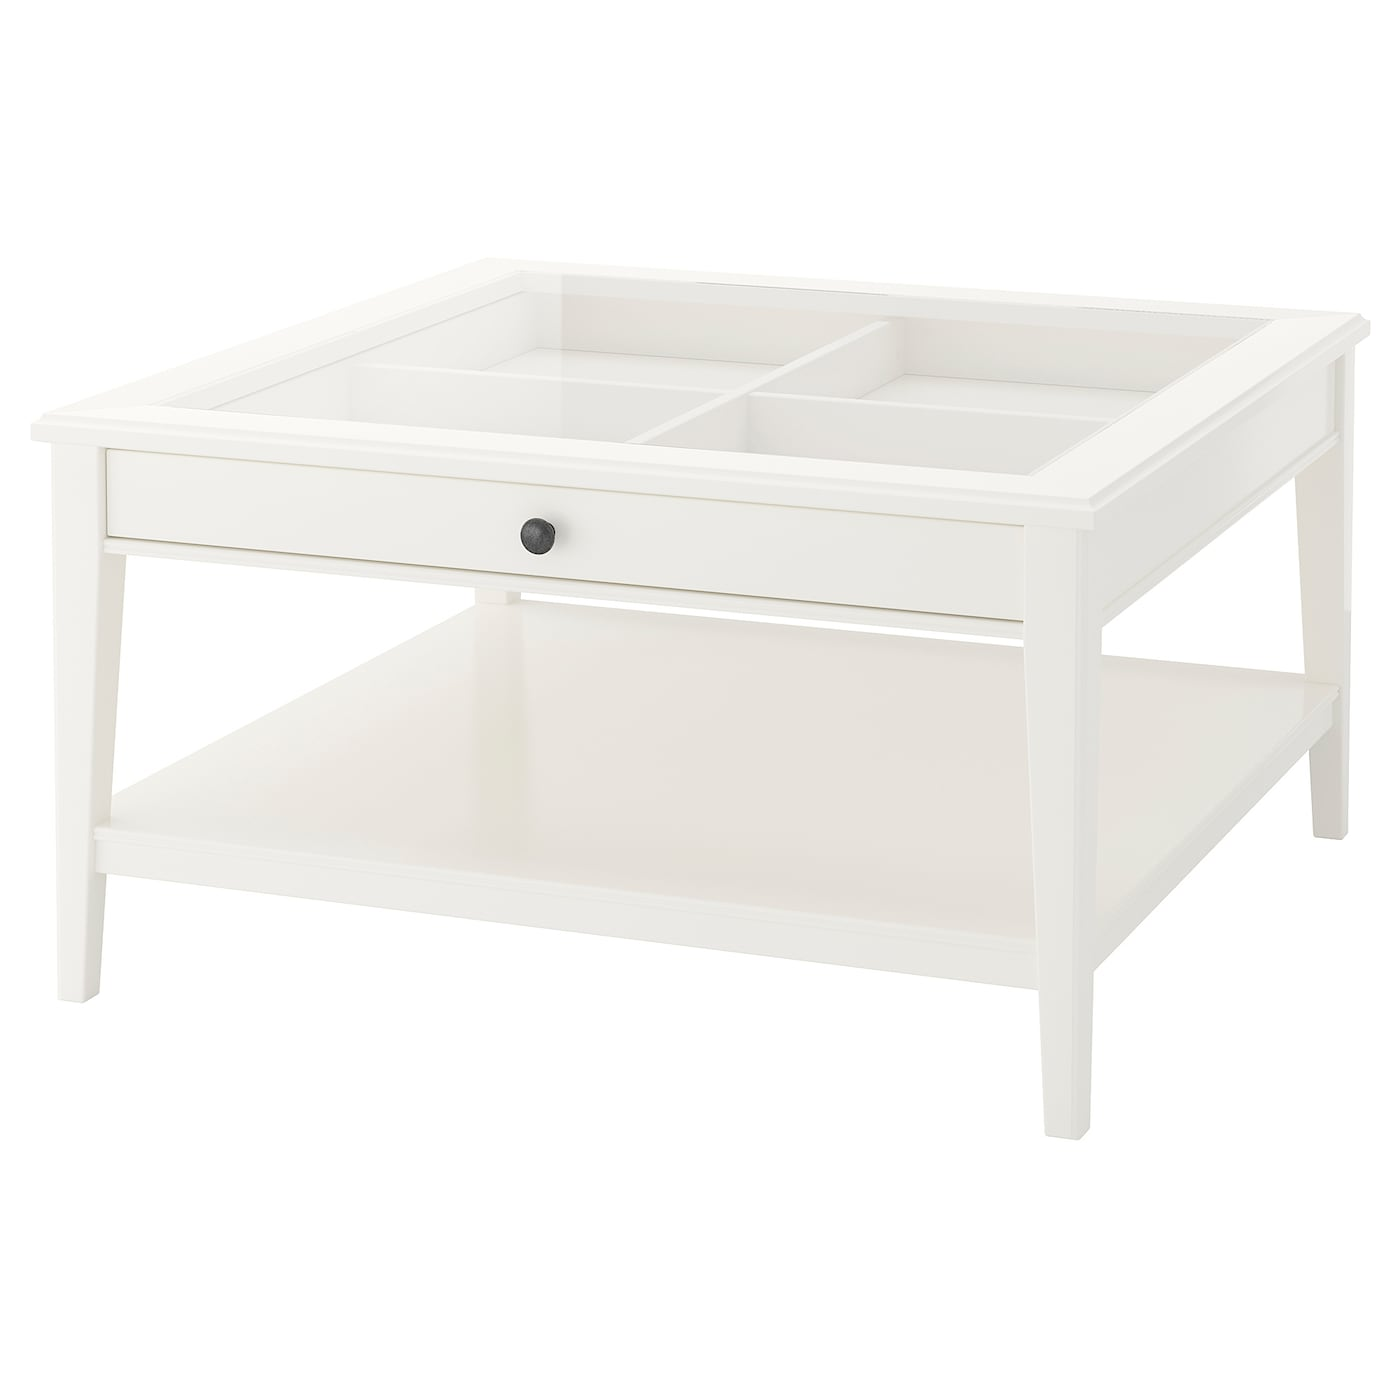 Buy Liatorp Coffee Table 93x93 Cm Online Uae Ikea [ 1400 x 1400 Pixel ]